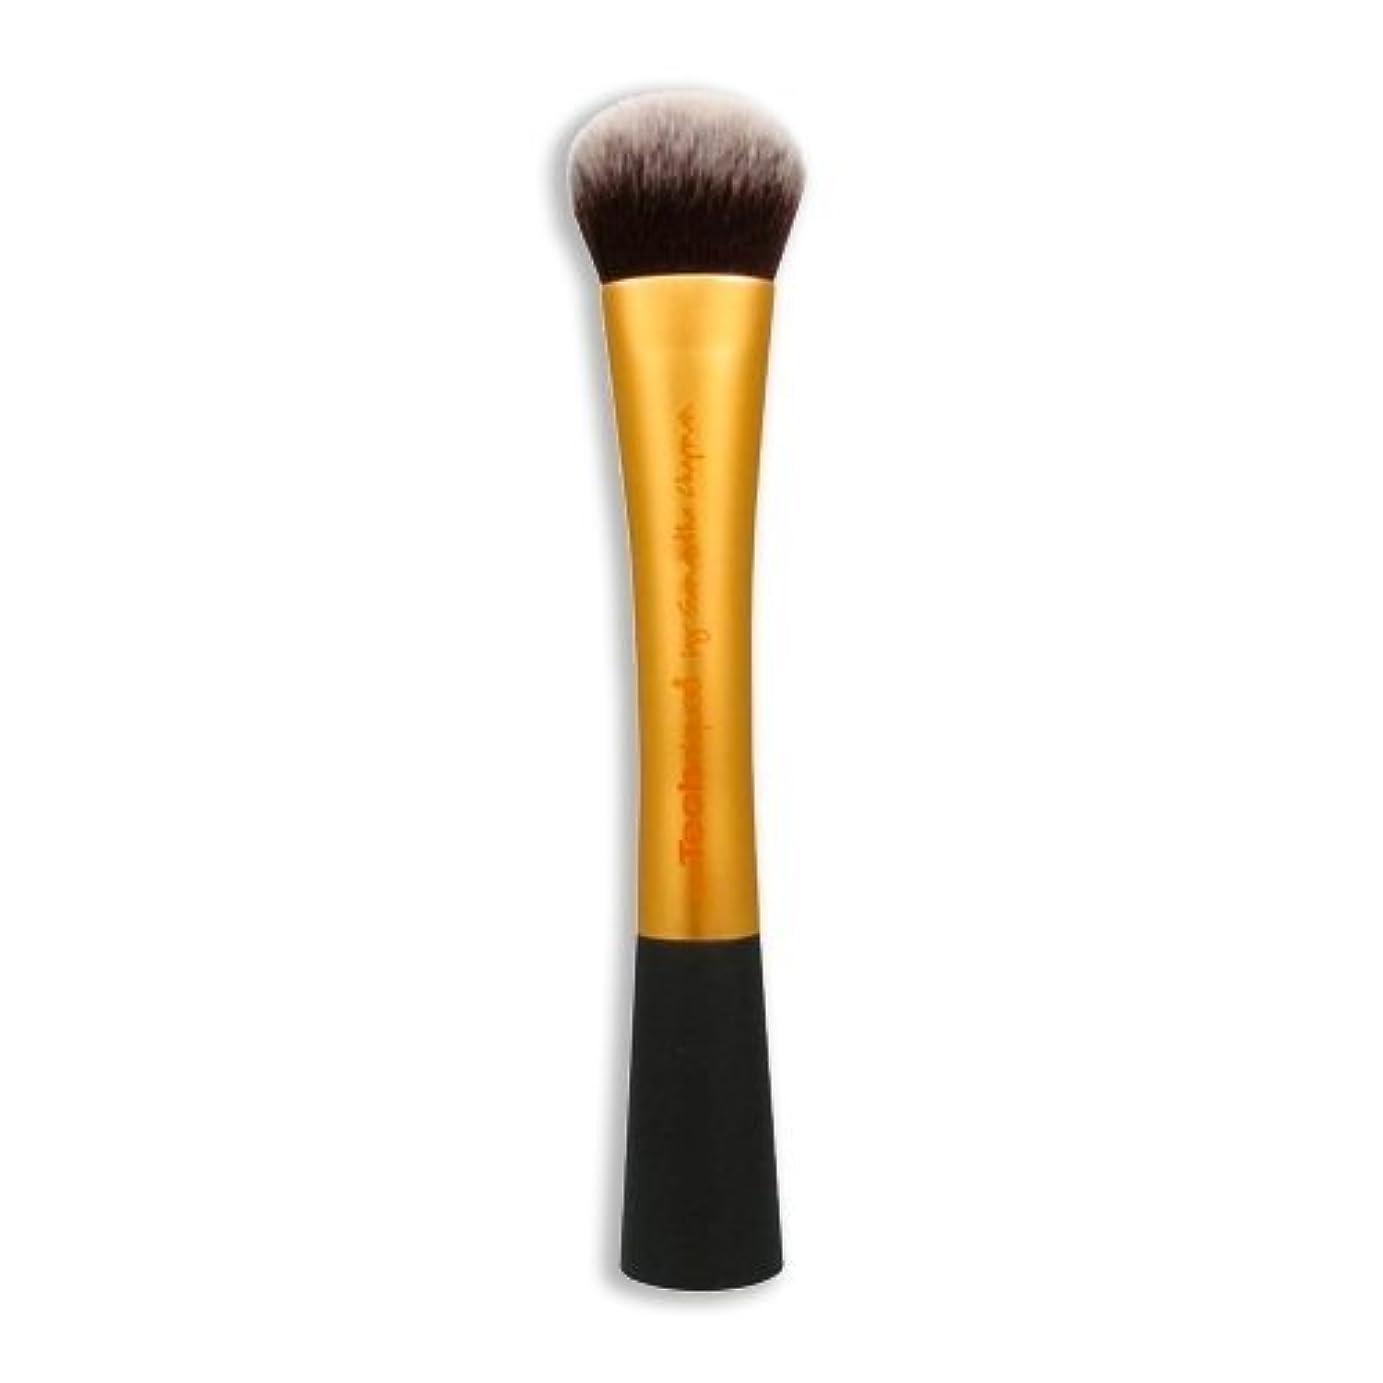 環境保護主義者小石公園Real Techniques Expert Face Brush - Expert Face Brush (並行輸入品)